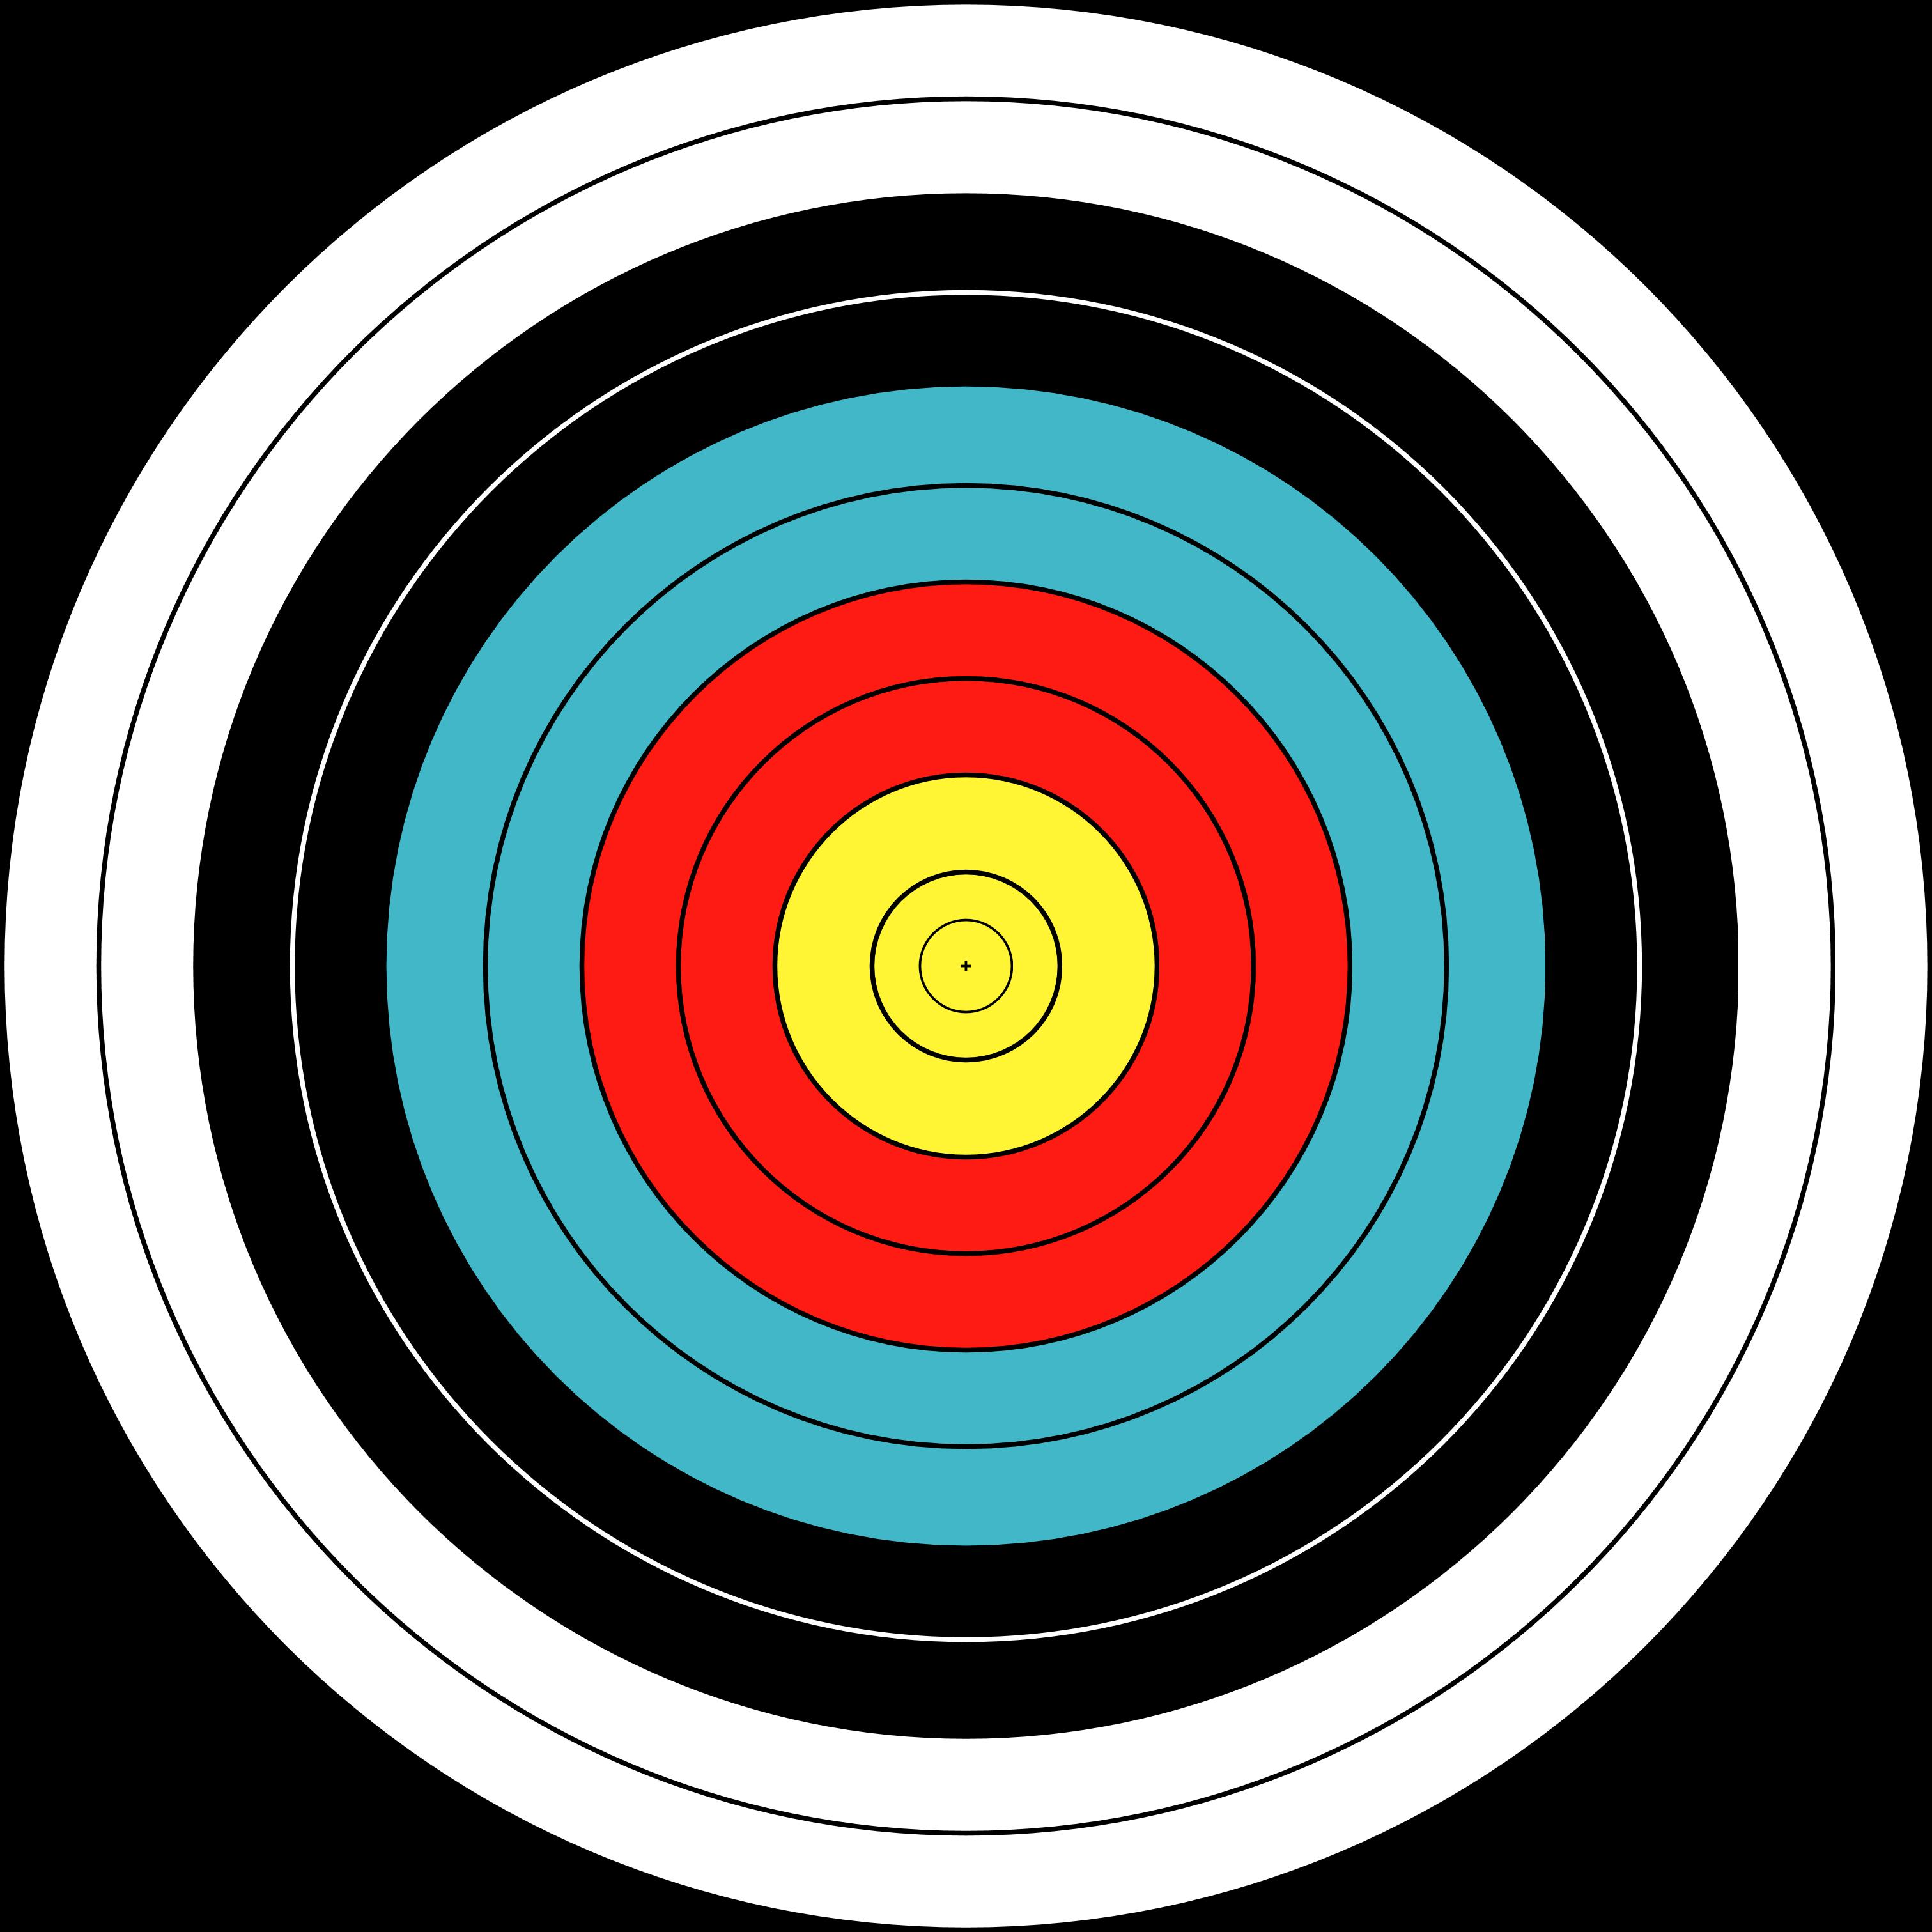 vector royalty free stock Free PNG Target Bullseye Transparent Target Bullseye